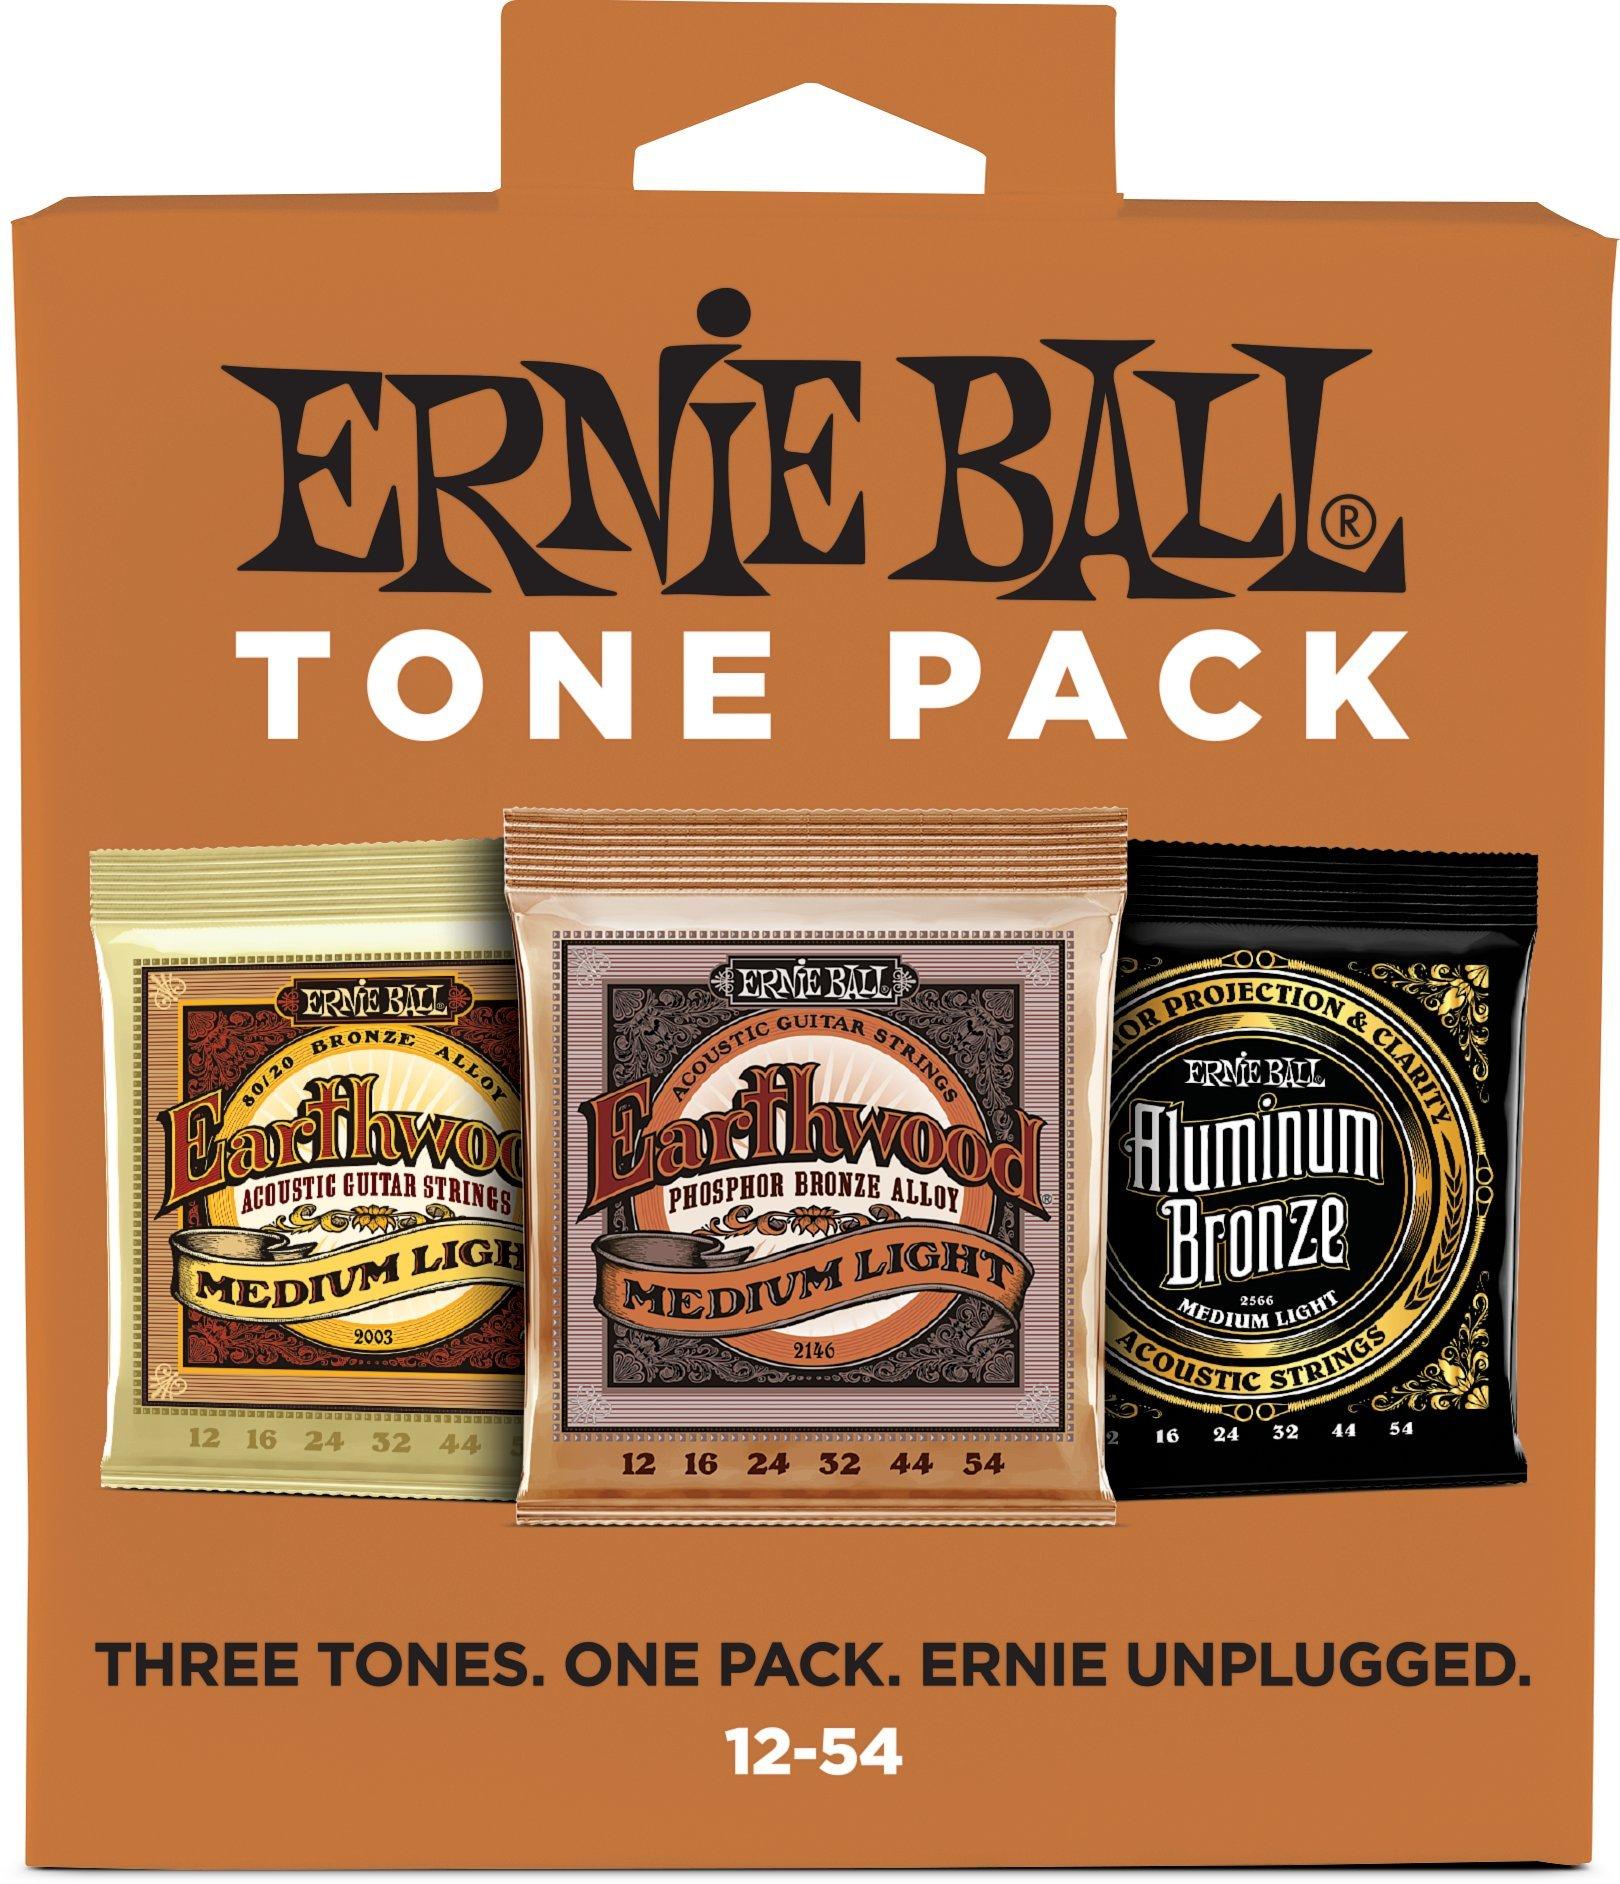 Ernie Ball Medium Light Acoustic Tone Pack - 12-54 Gauge